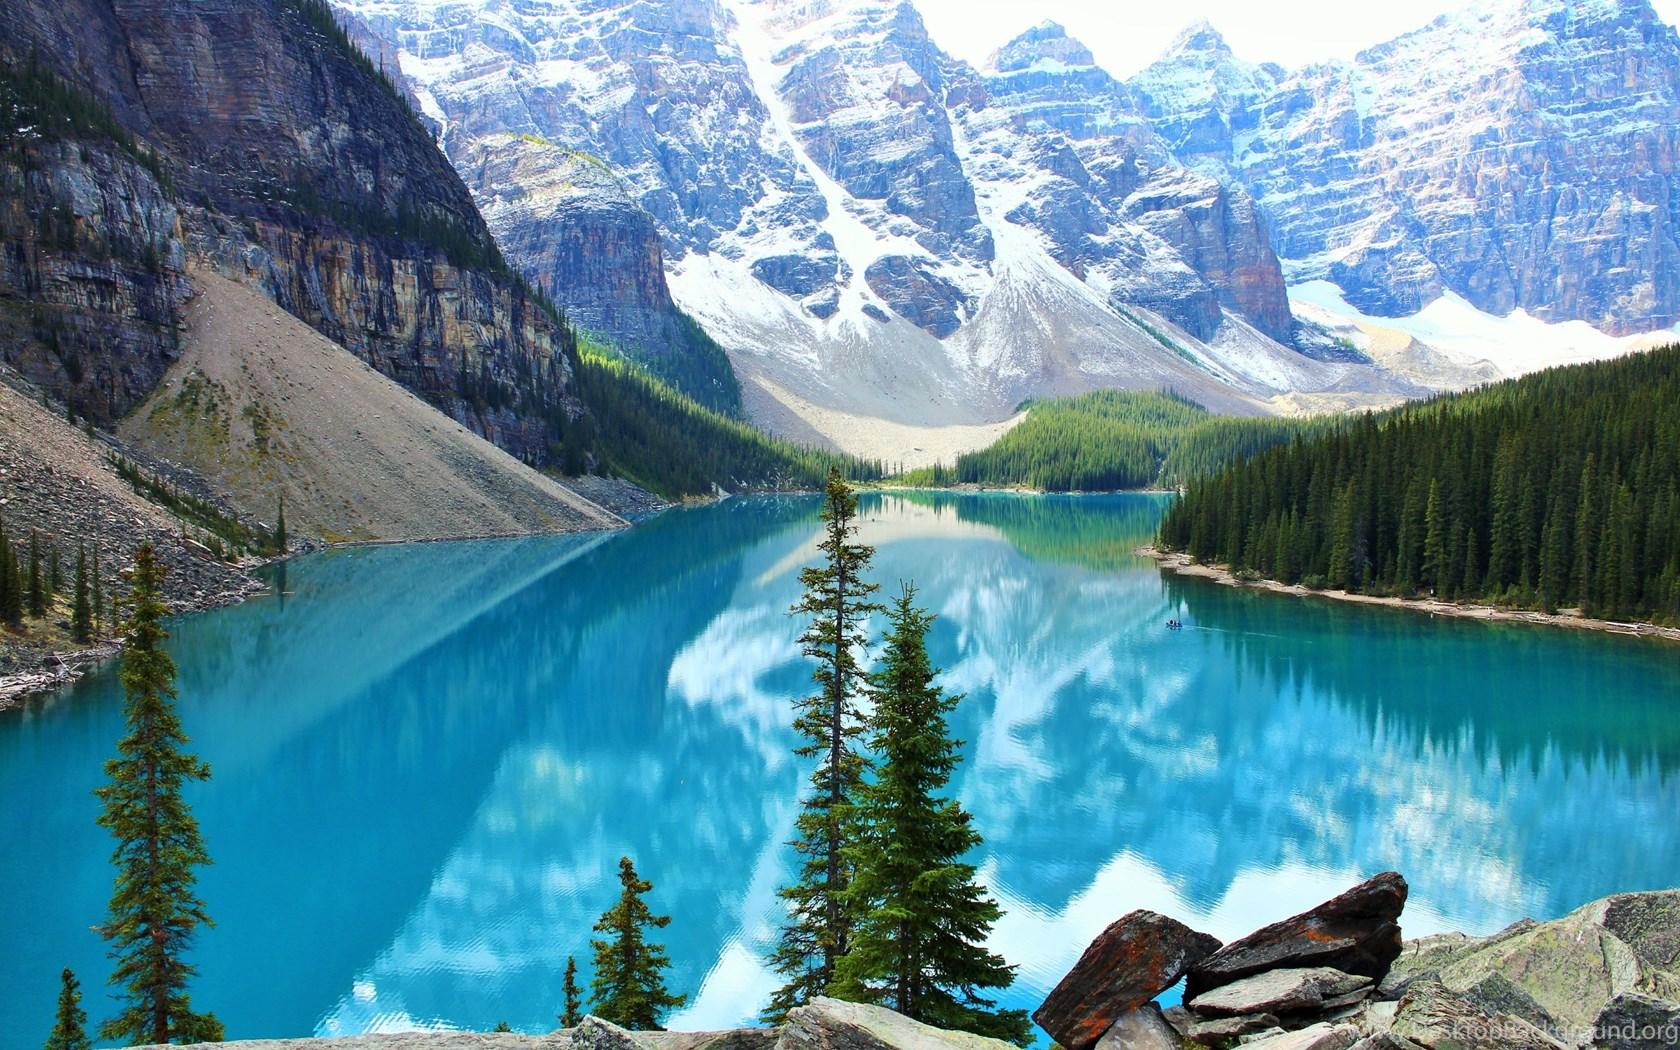 Moraine Lake HD Wallpapers. 4K Wallpapers Desktop Background